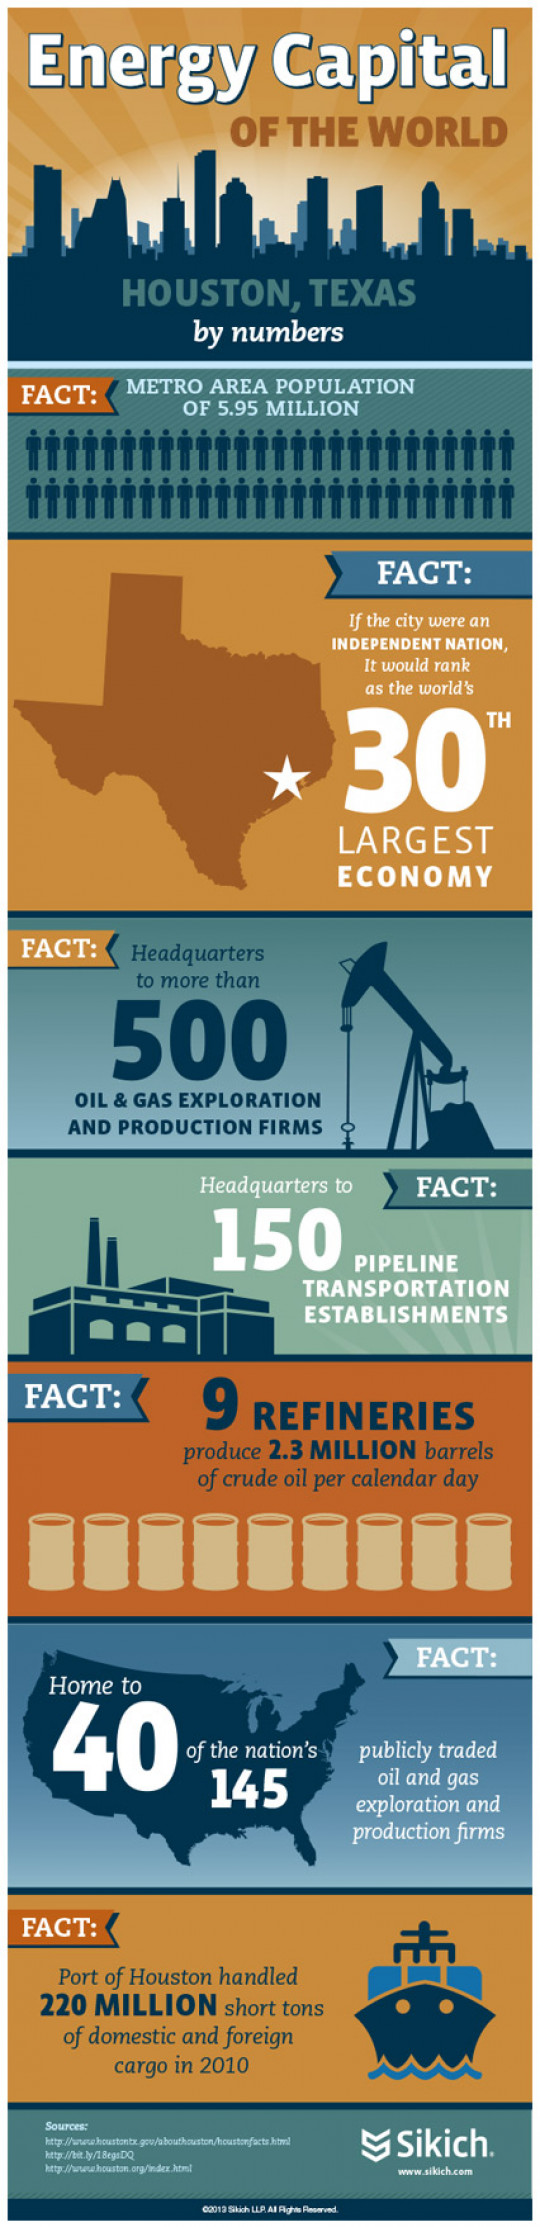 Houston, Texas: Energy Capital of the World